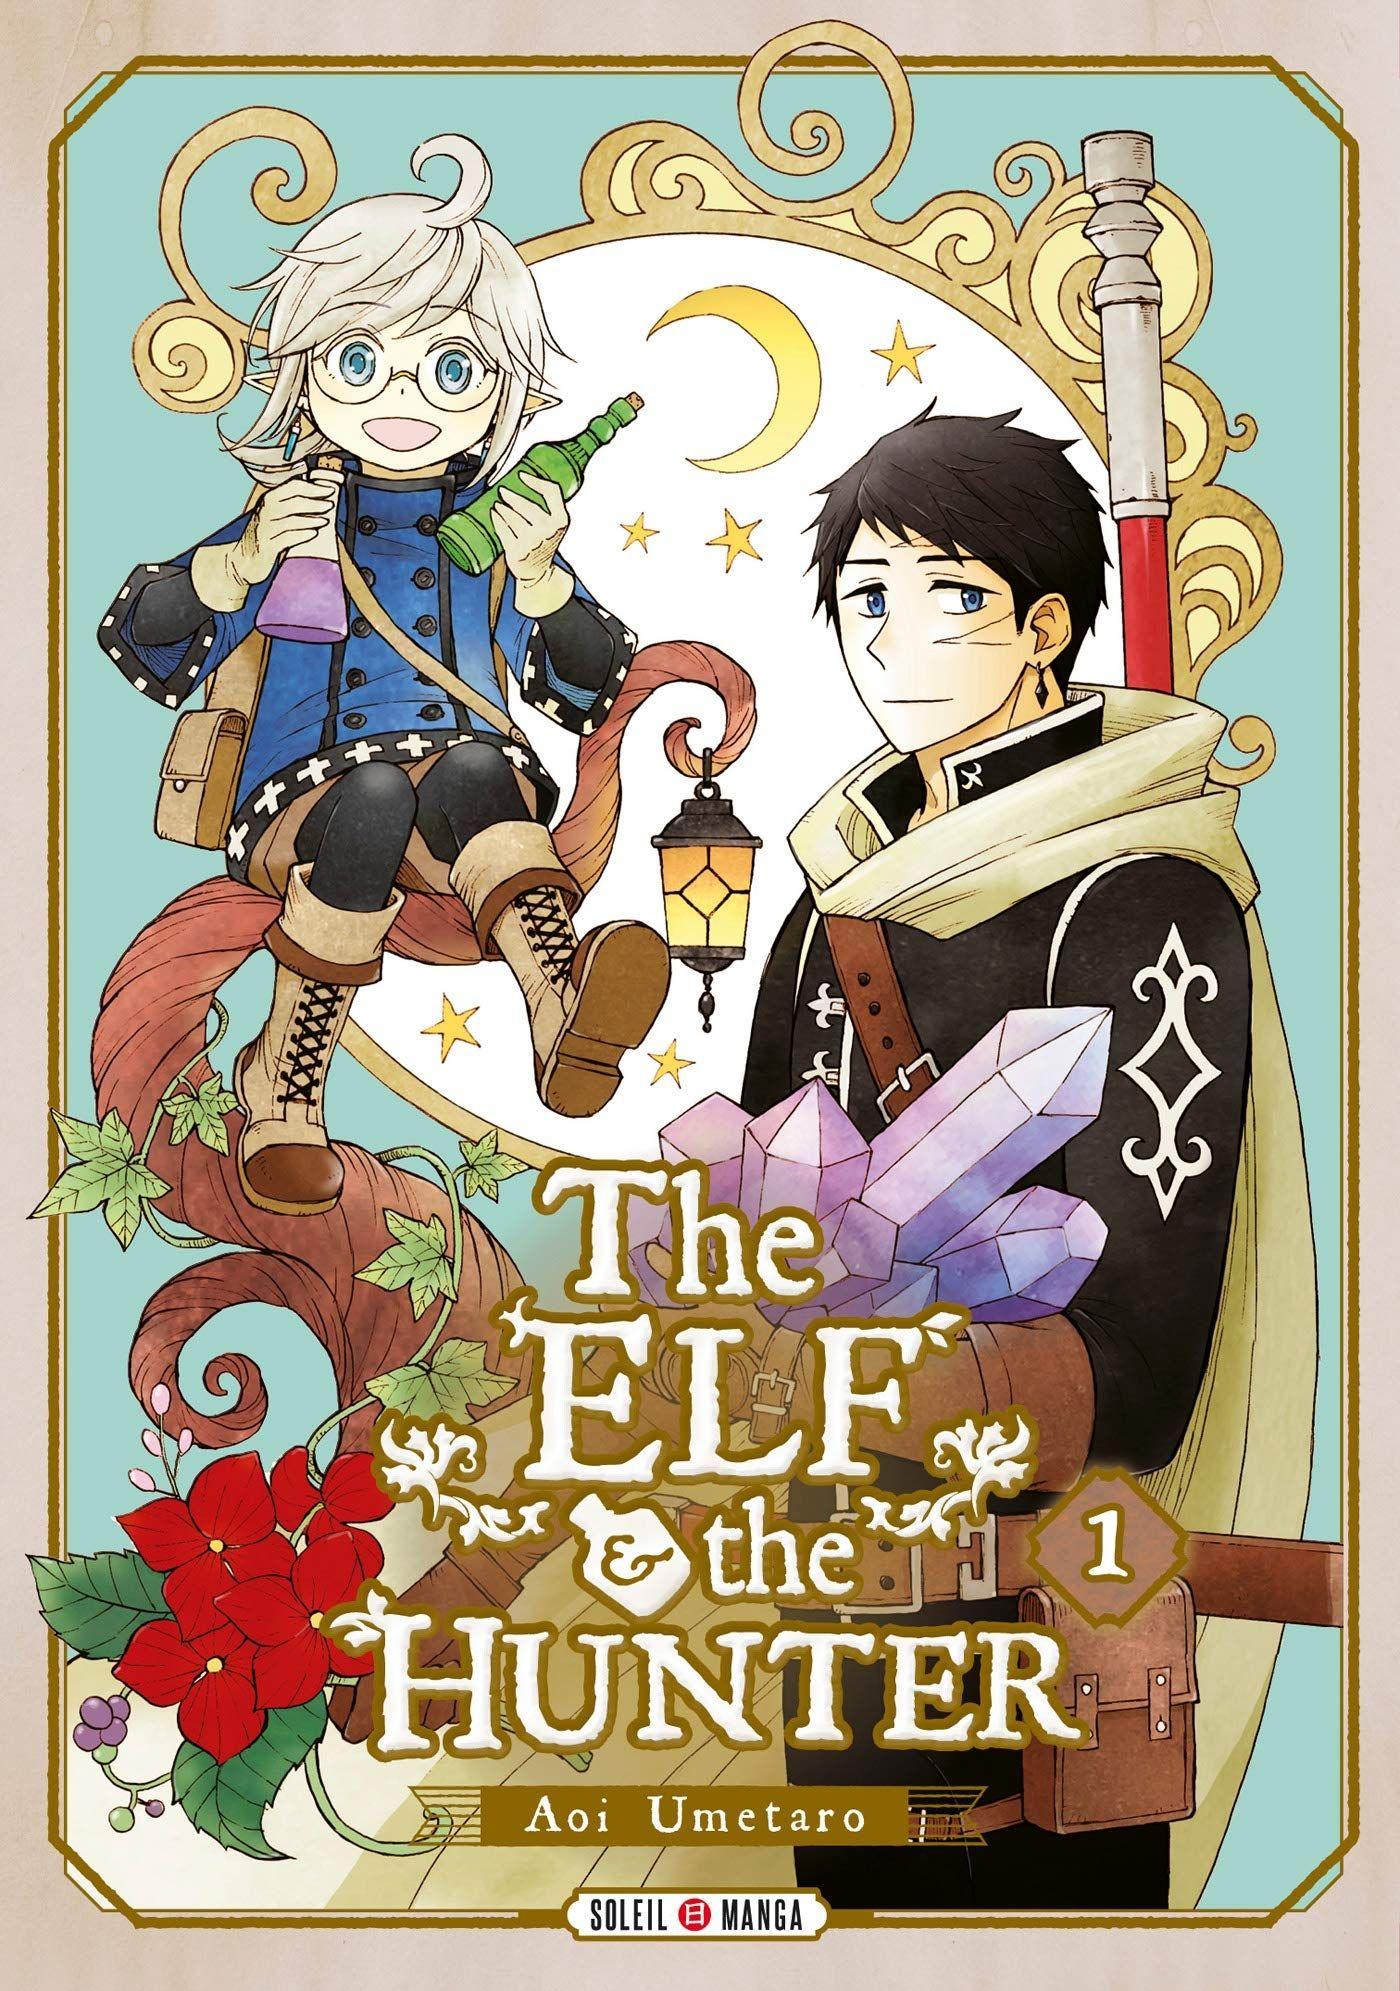 Sortie Manga au Québec JUIN 2021 Elf_and_the_Hunter_1_soleil